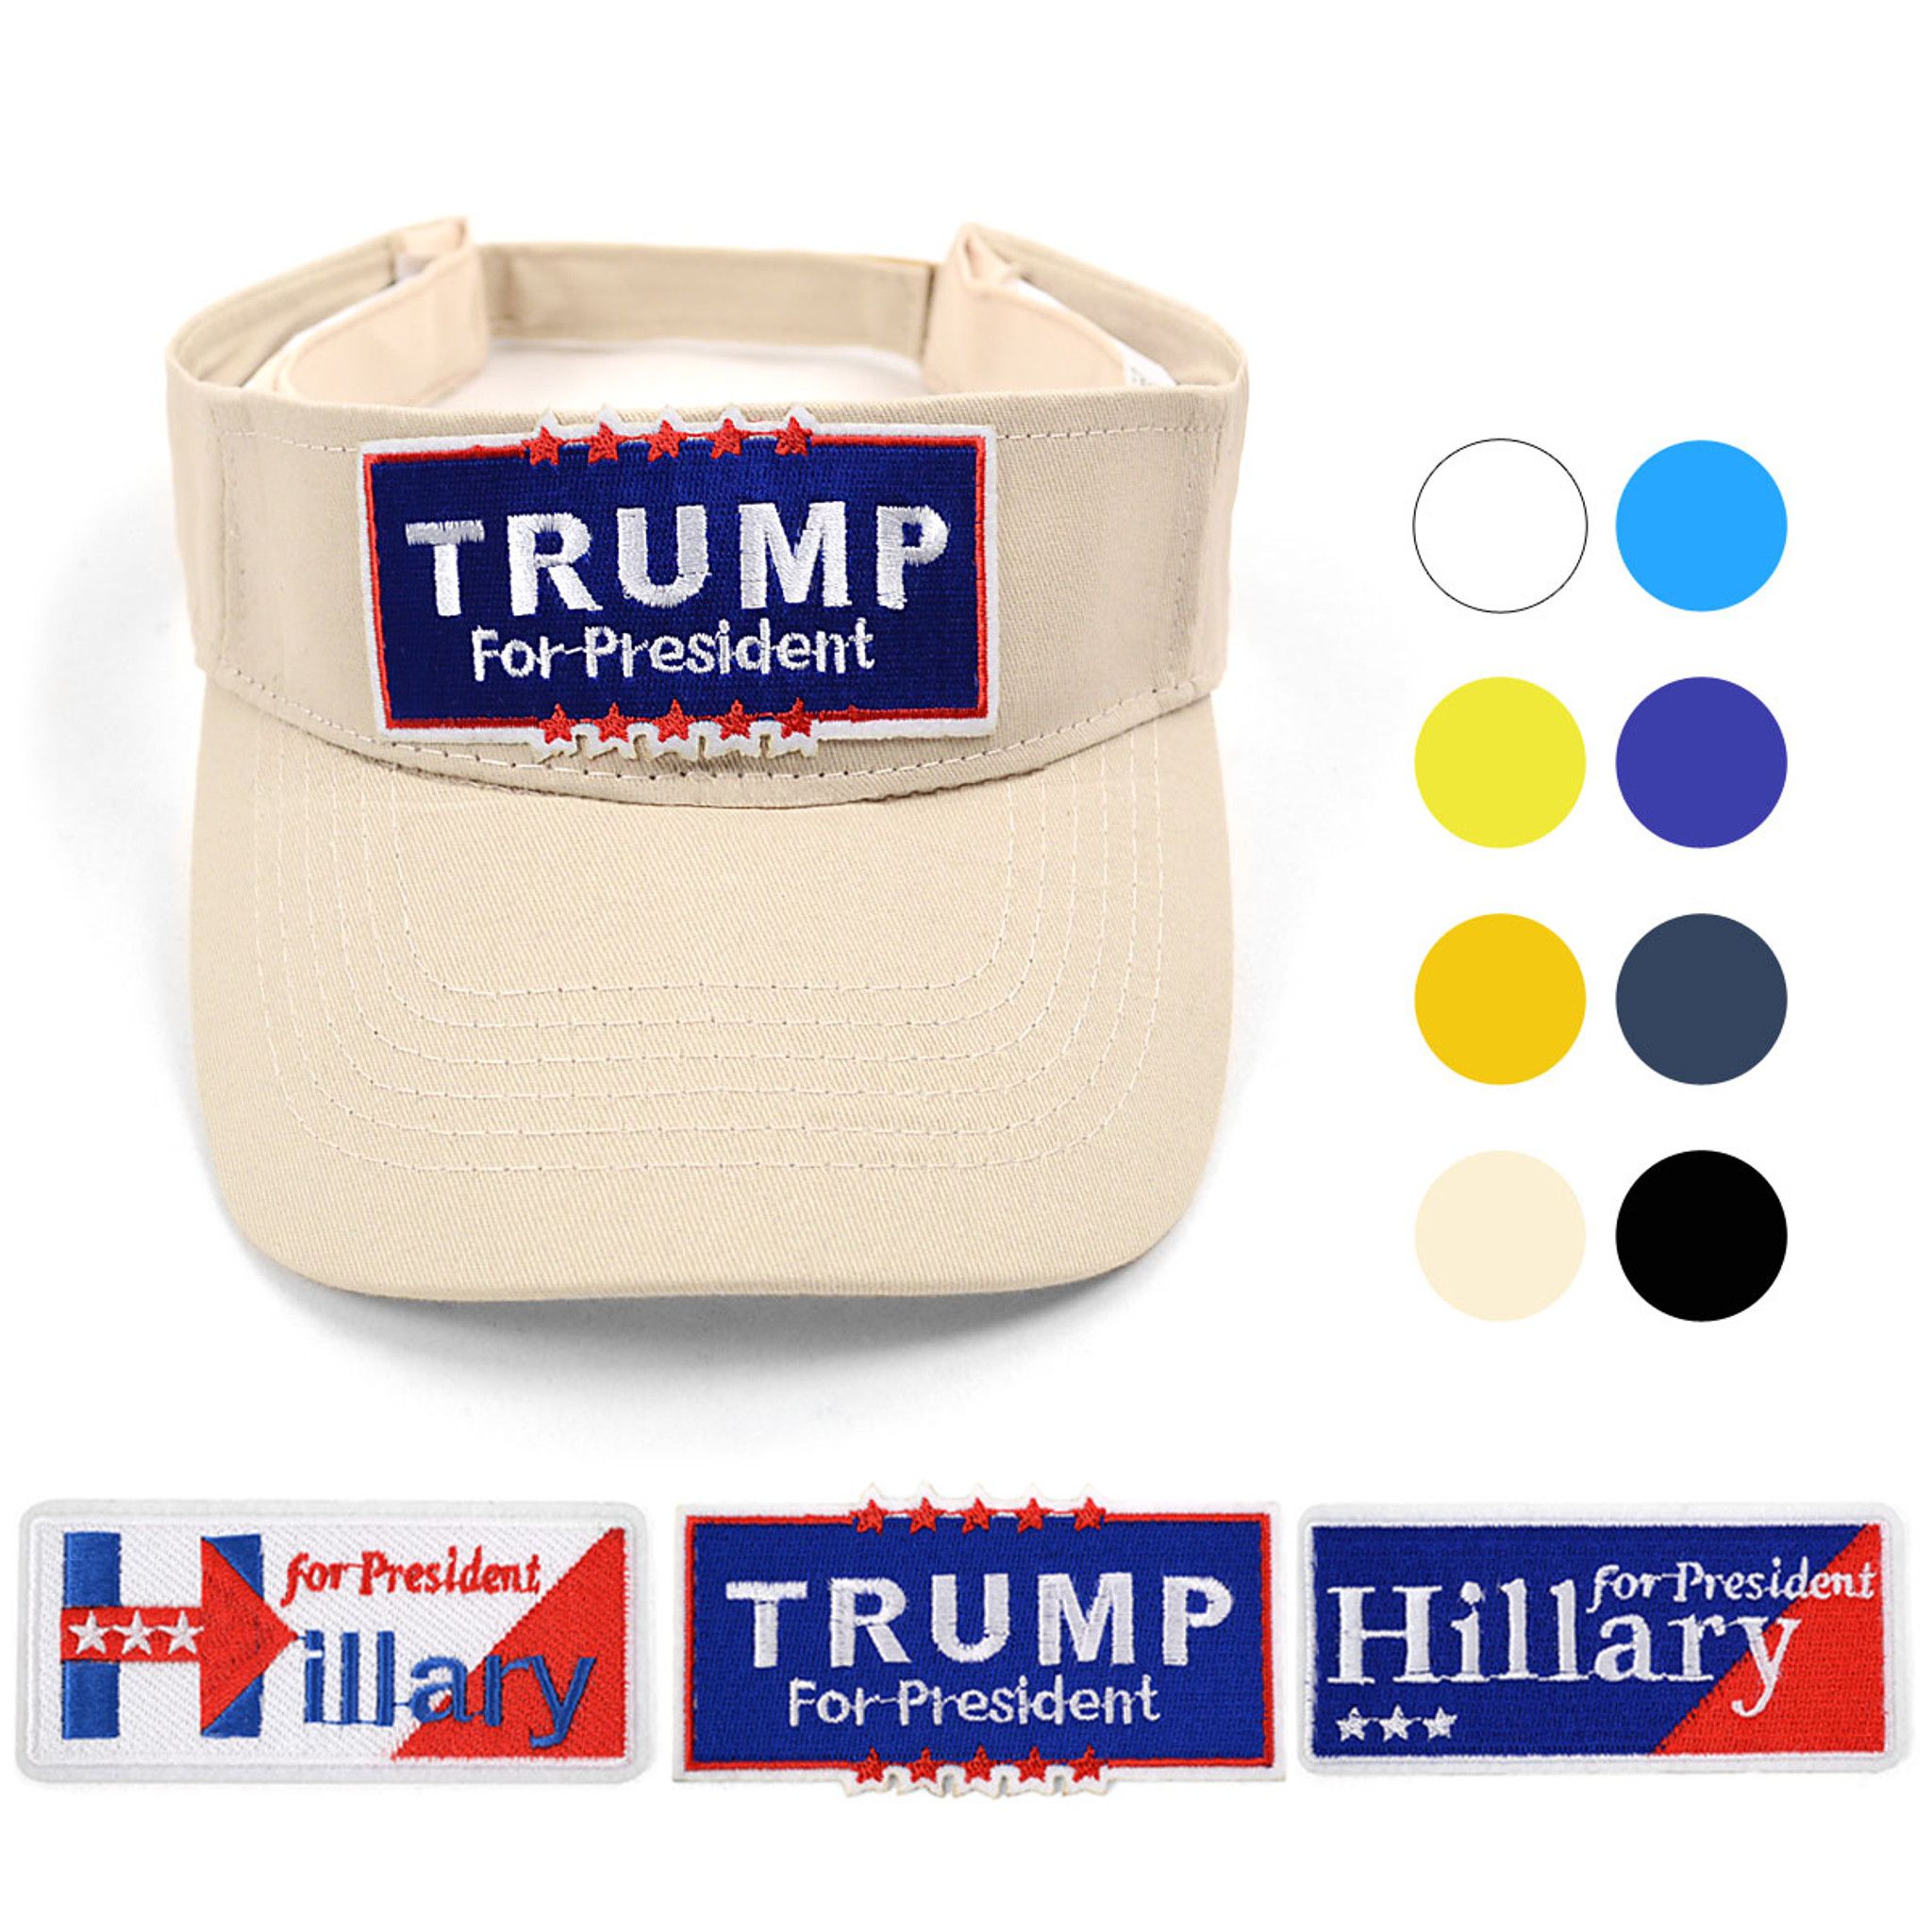 Donald Trump for President 2016 Adjustable Sun Visor Hat